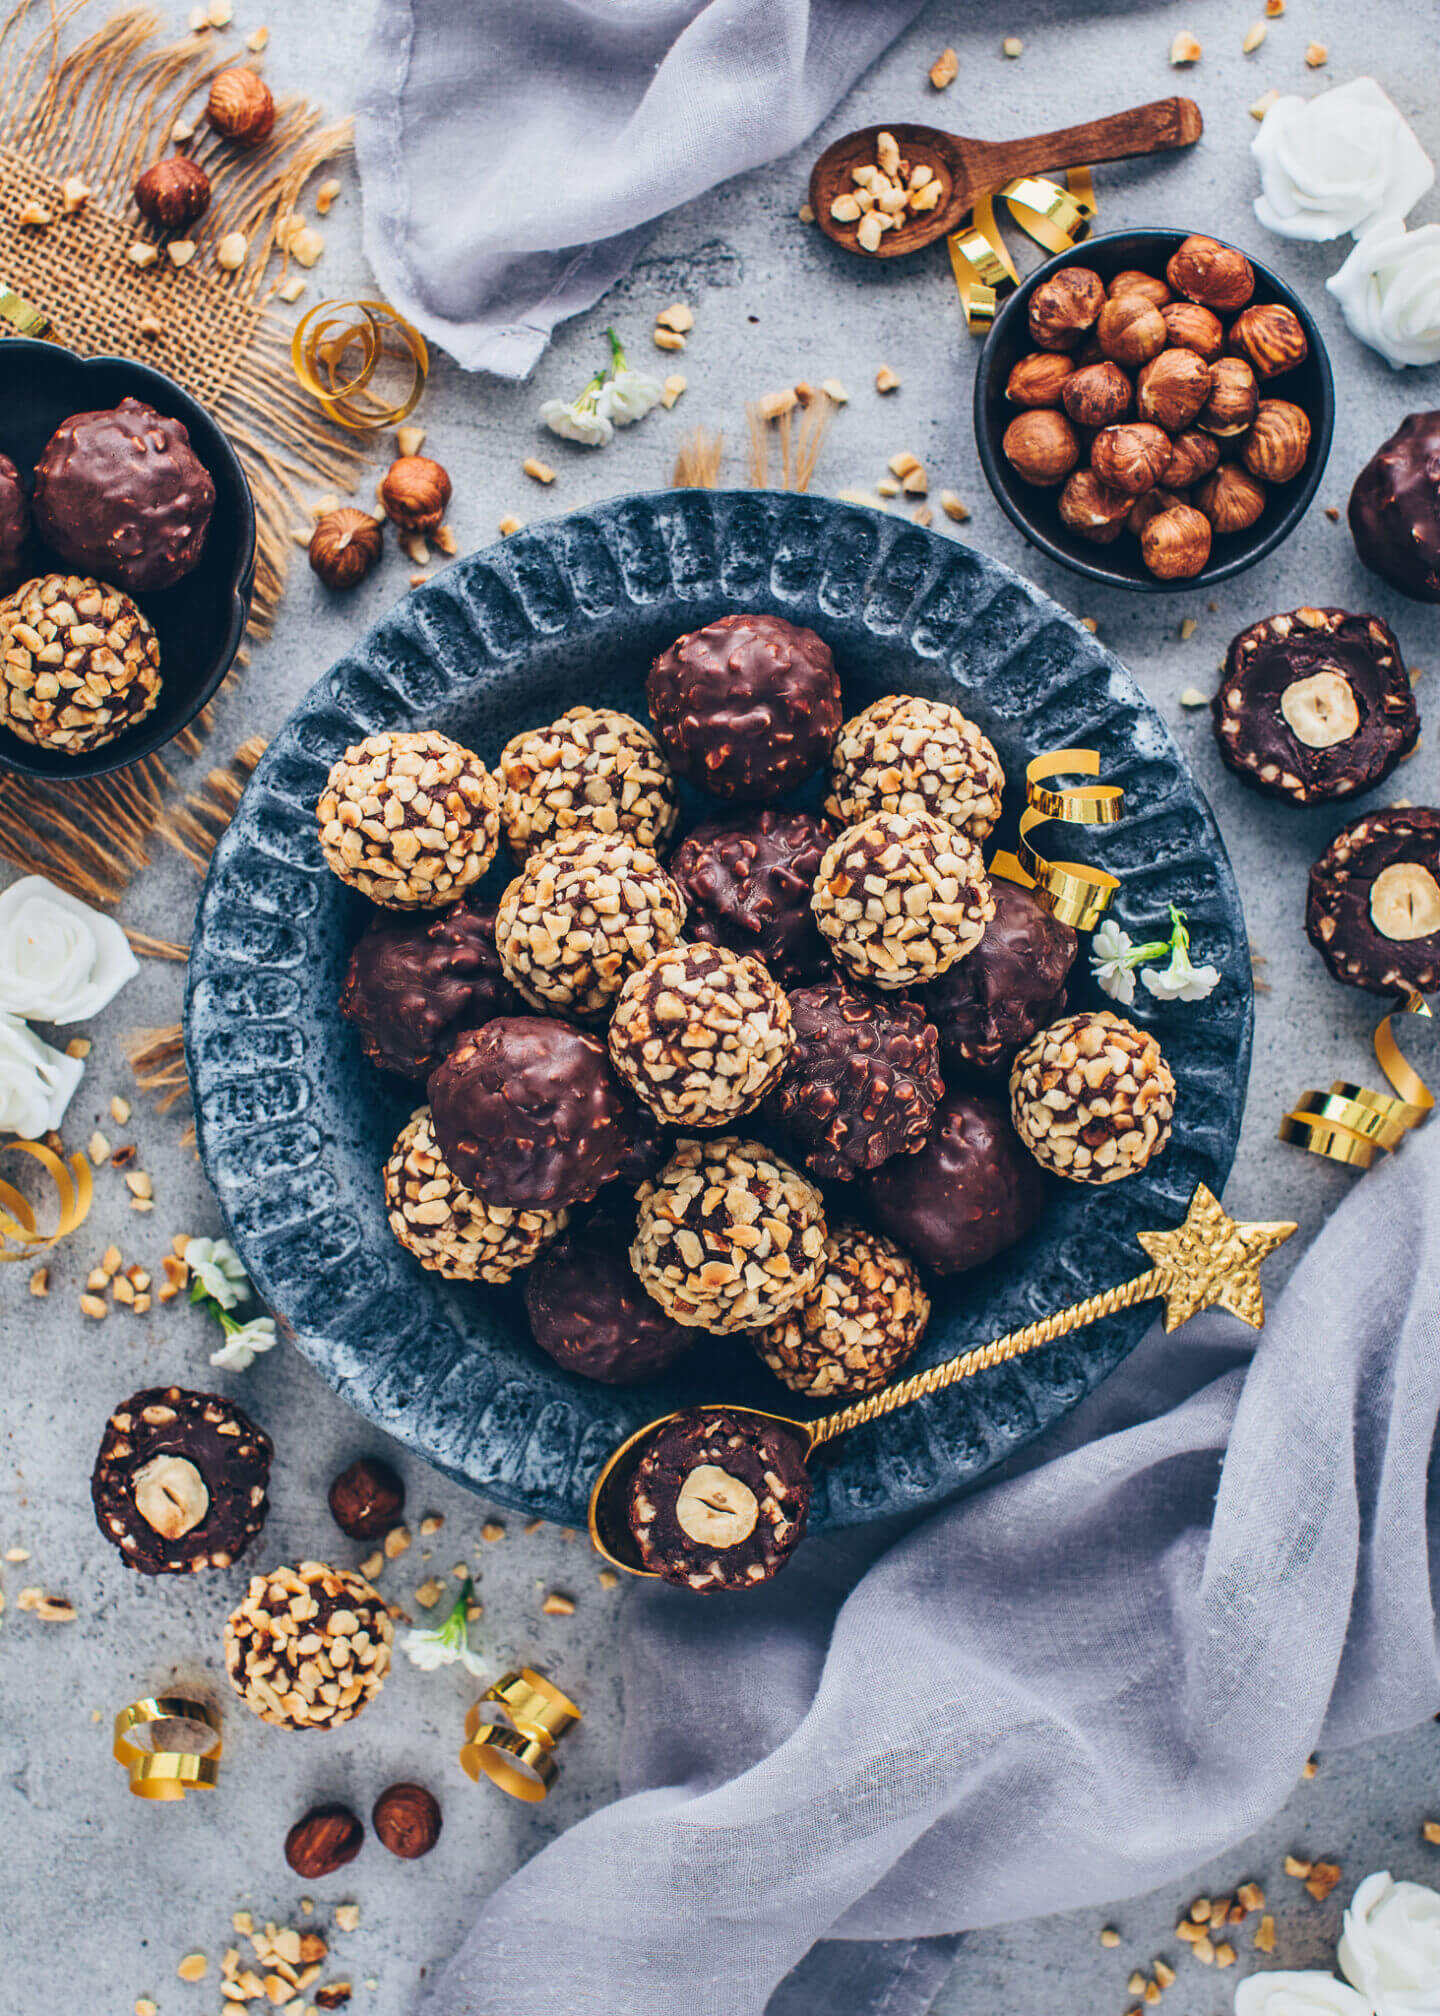 Vegan Ferrero Rocher - Chocolate Hazelnut Pralines